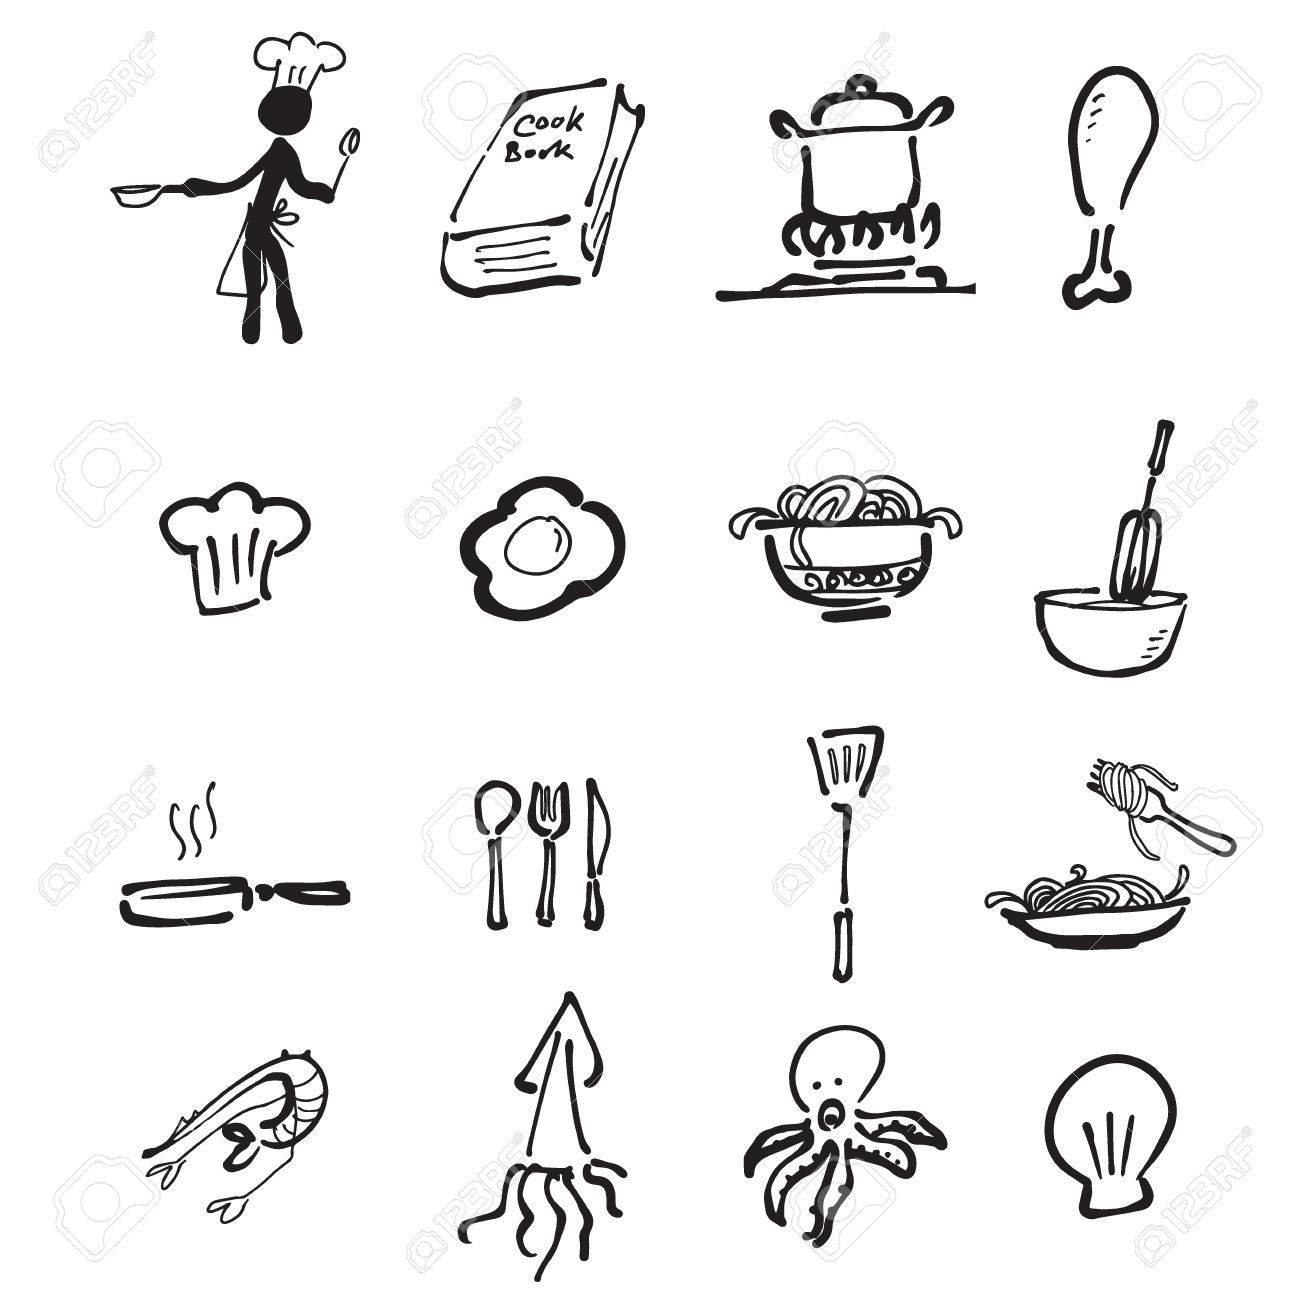 Chef Et Bande Dessinee De Cuisine Dessin Icones Clip Art Libres De